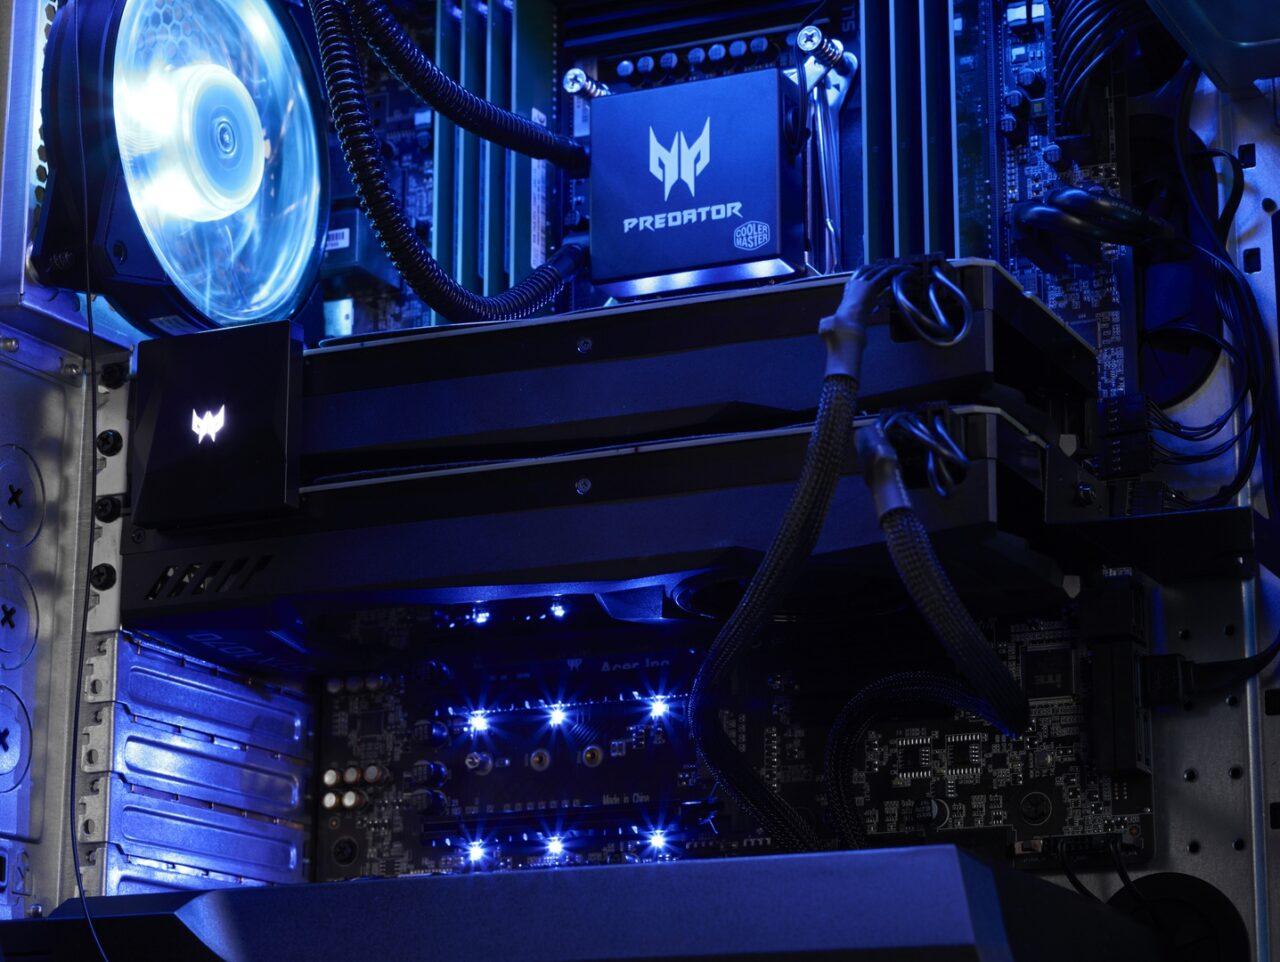 Сотрудничество Acer и NVIDIA вышло на некст-ген